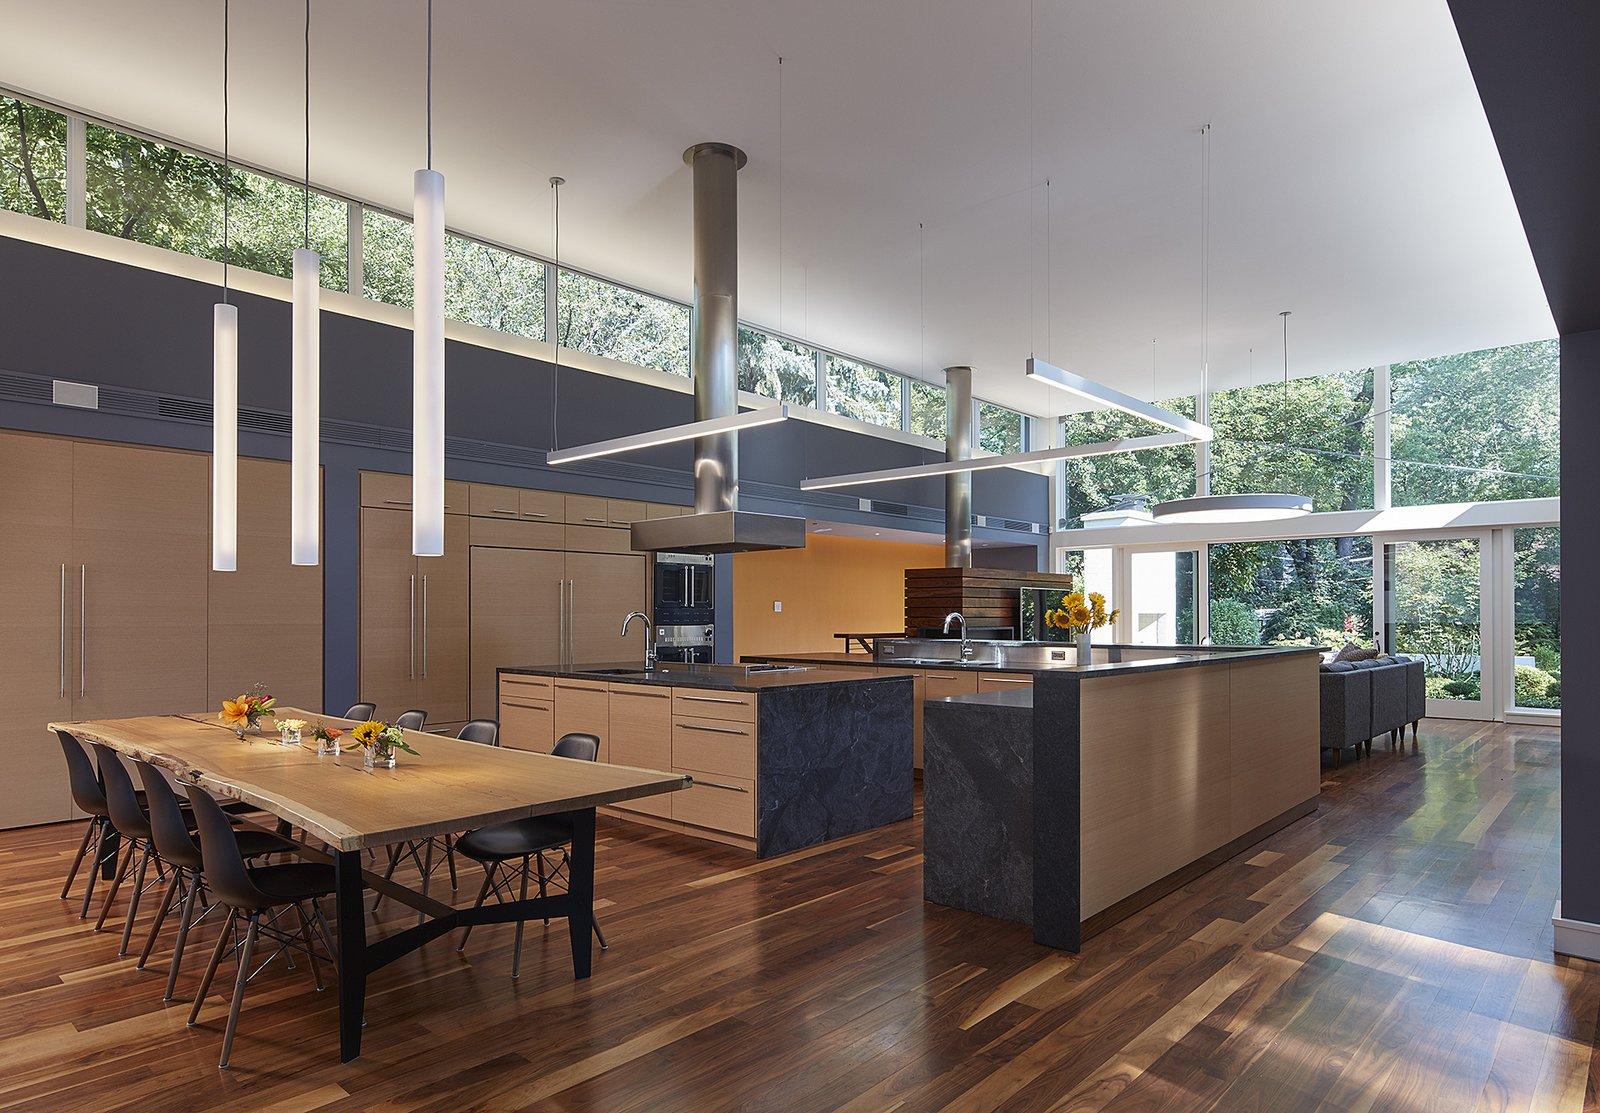 kitchen + dining  Courtyard Residence by Kuklinski + Rappe Architects